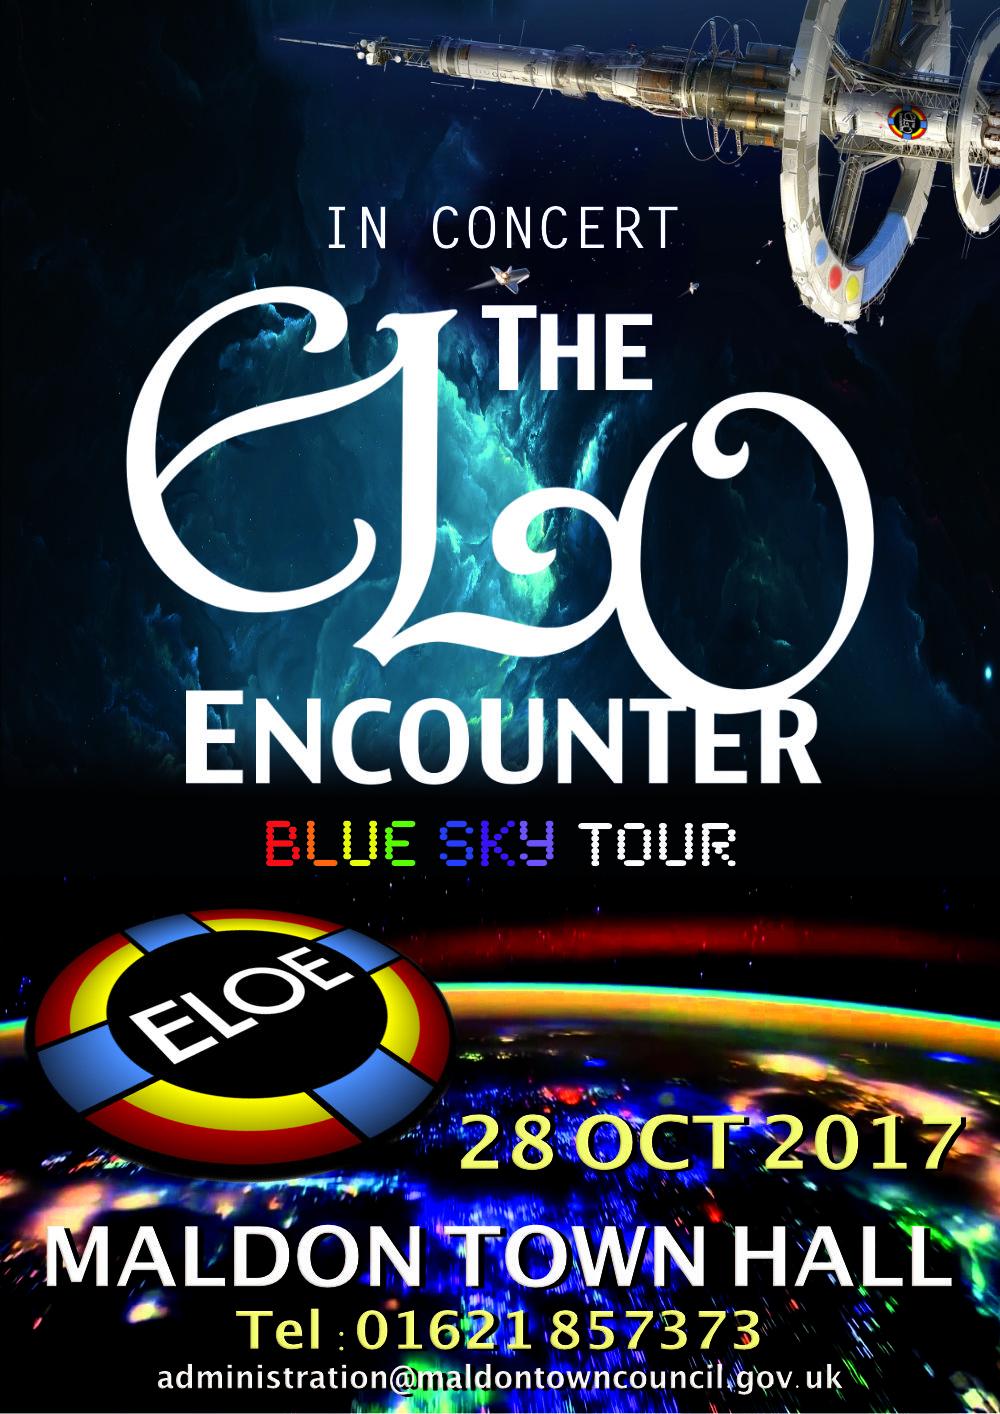 Maldon Town Hall - ELO Encounter Poster